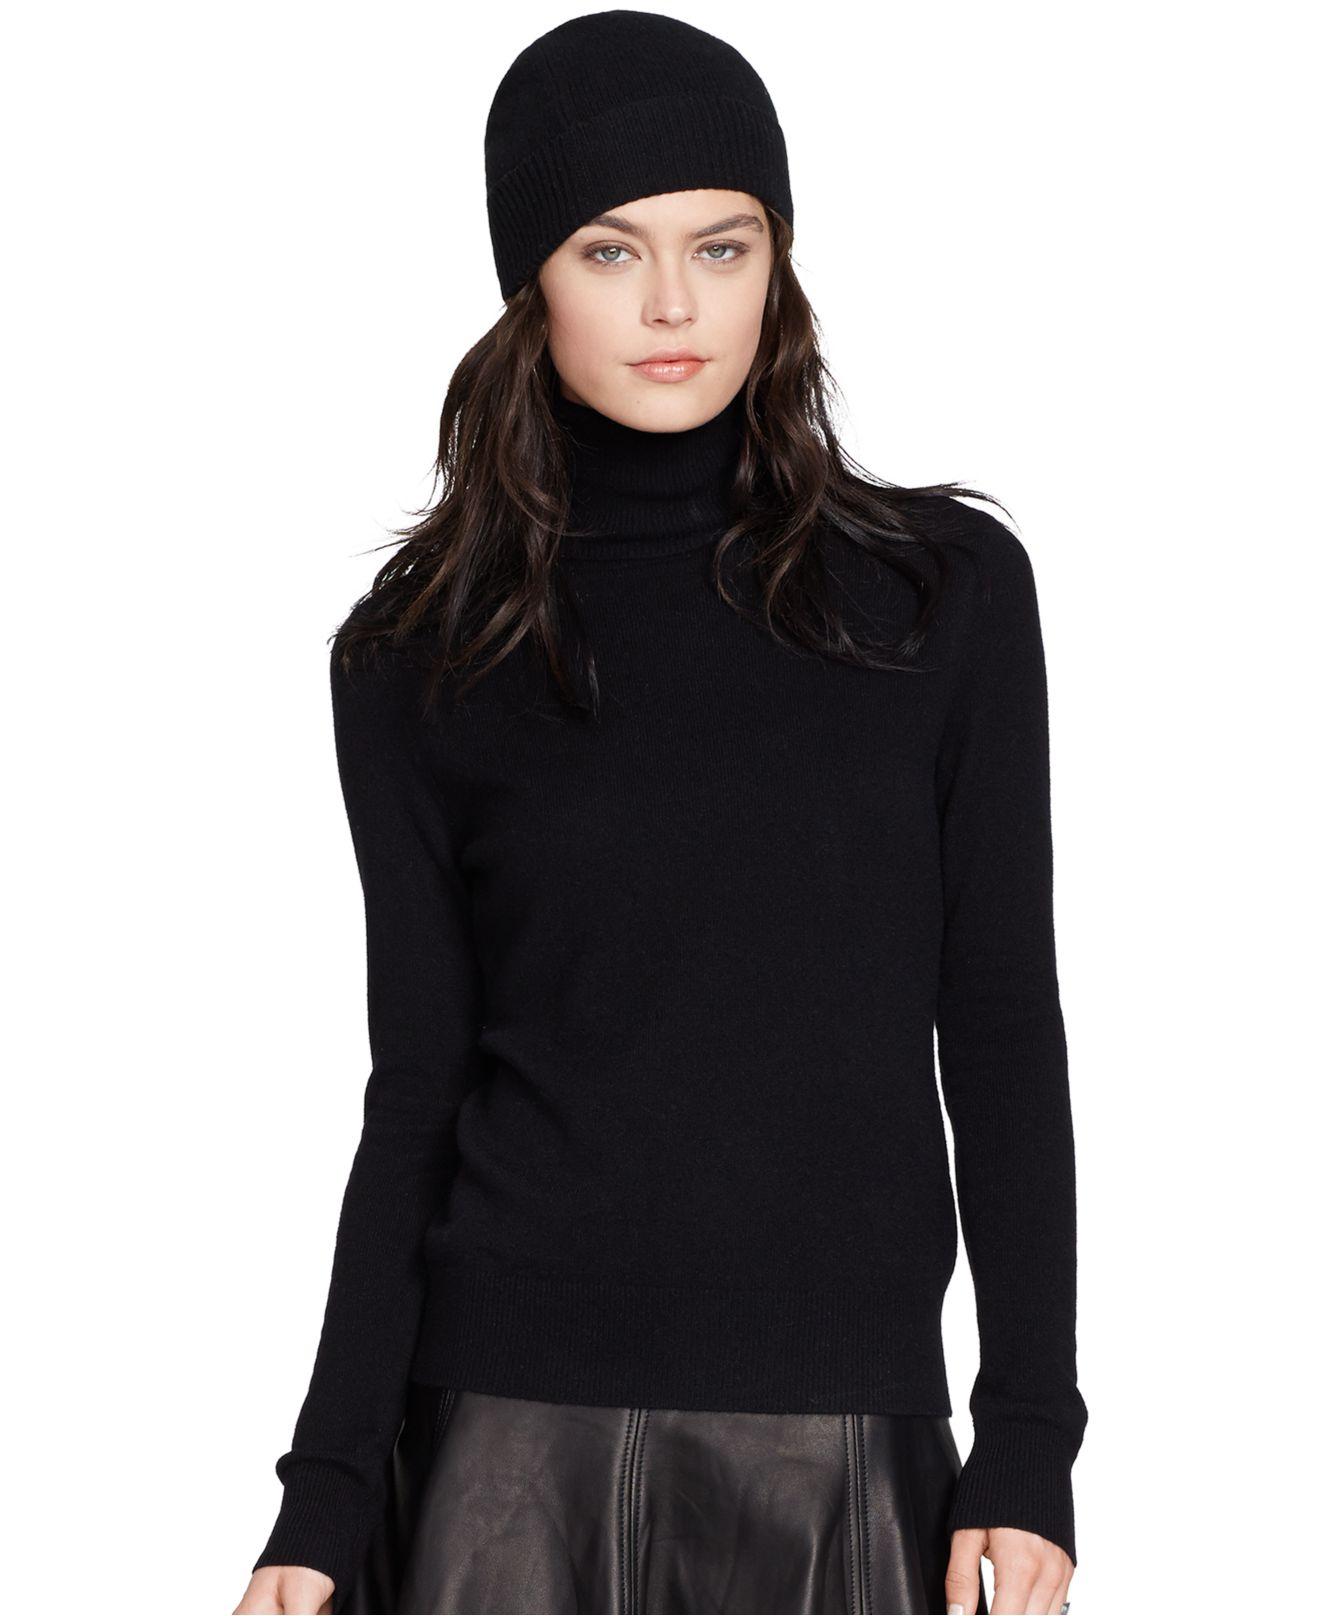 Polo ralph lauren Cashmere Gena Turtleneck in Black | Lyst